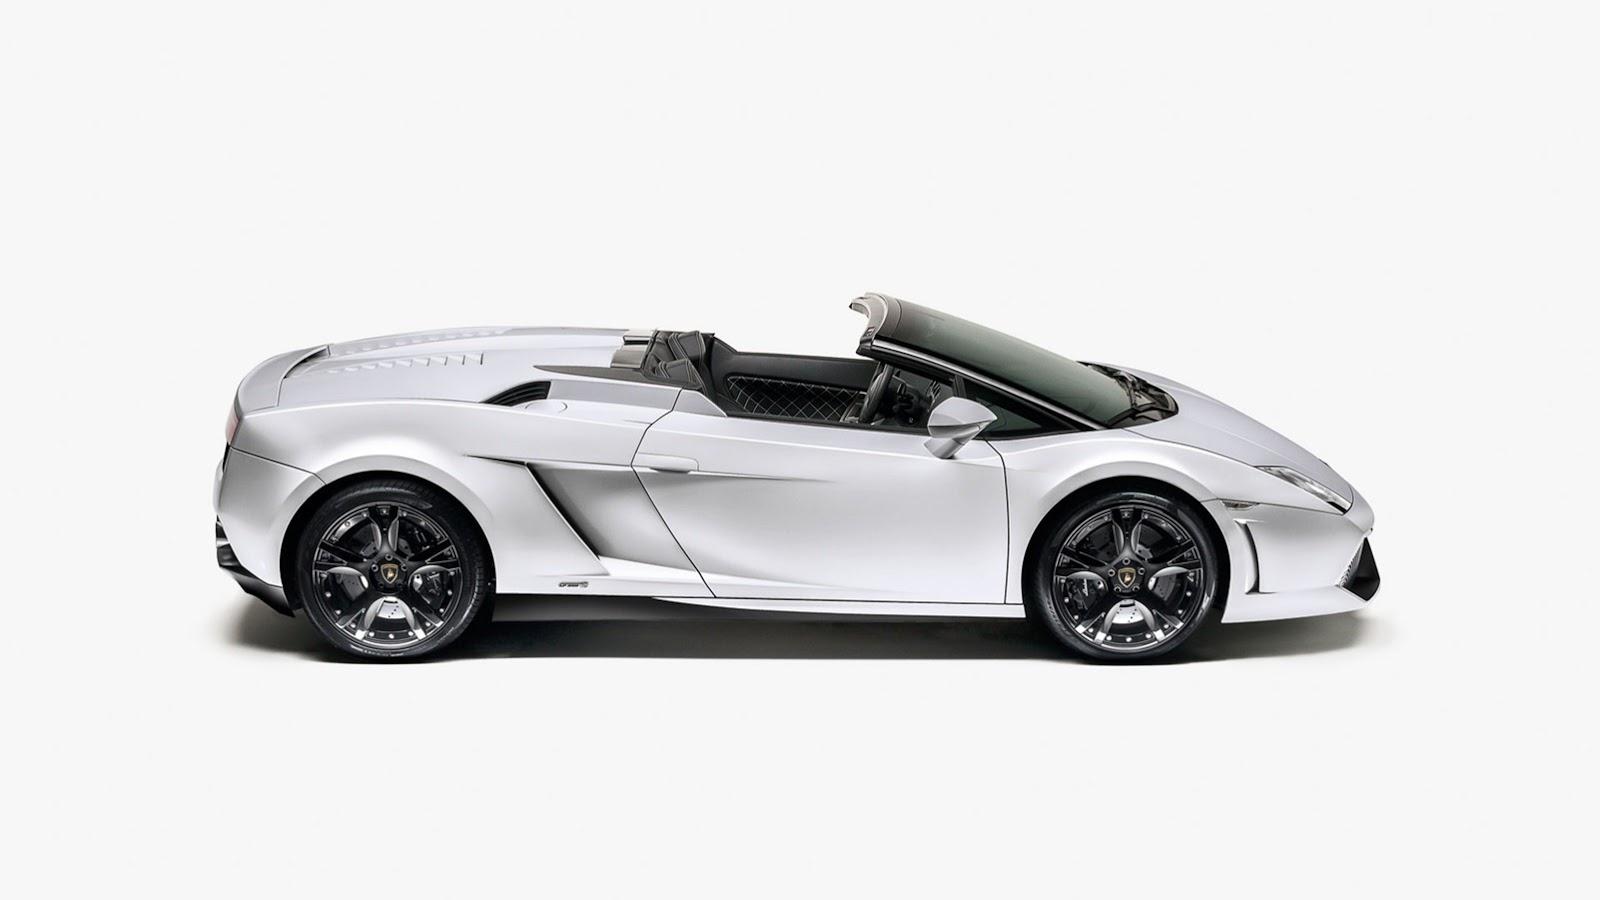 Lamborghini_Gallardo_Spyder_Facelift_Side